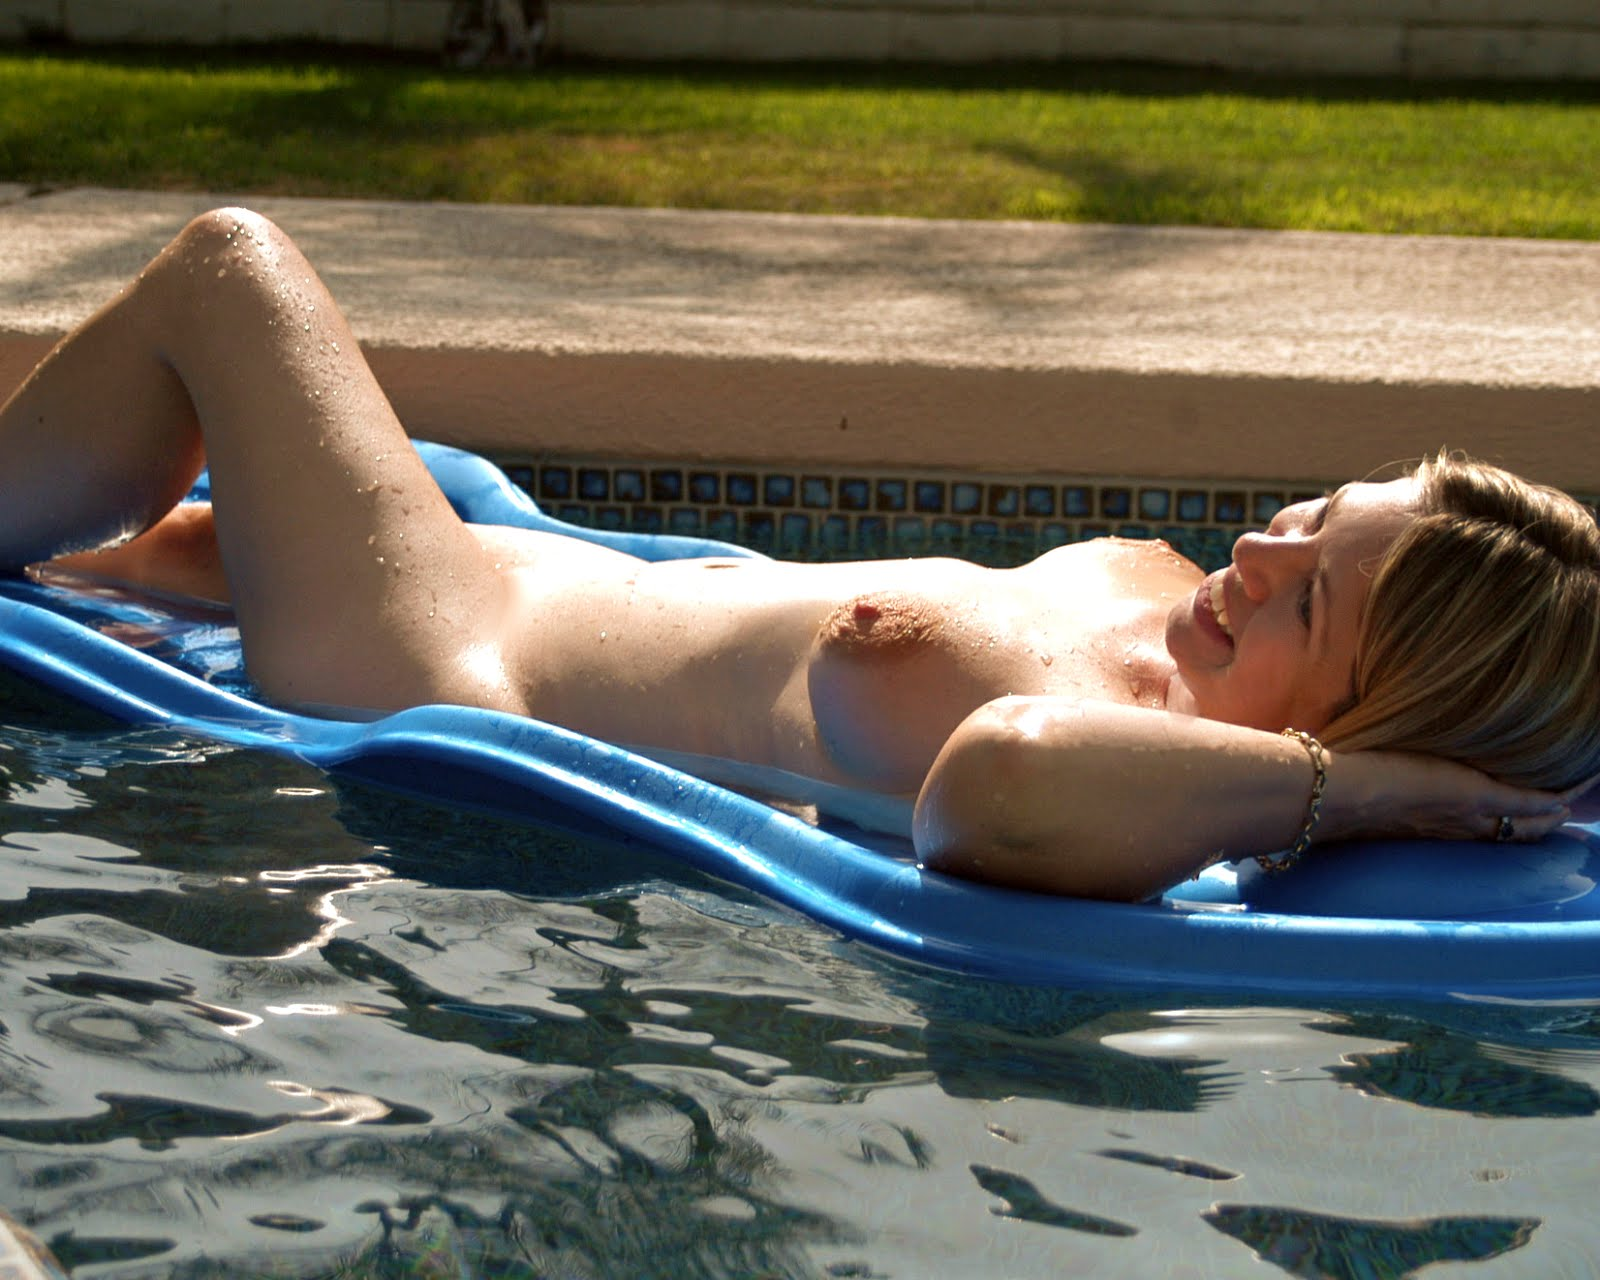 Skinny Young Teen Girls Sunbathing Candid